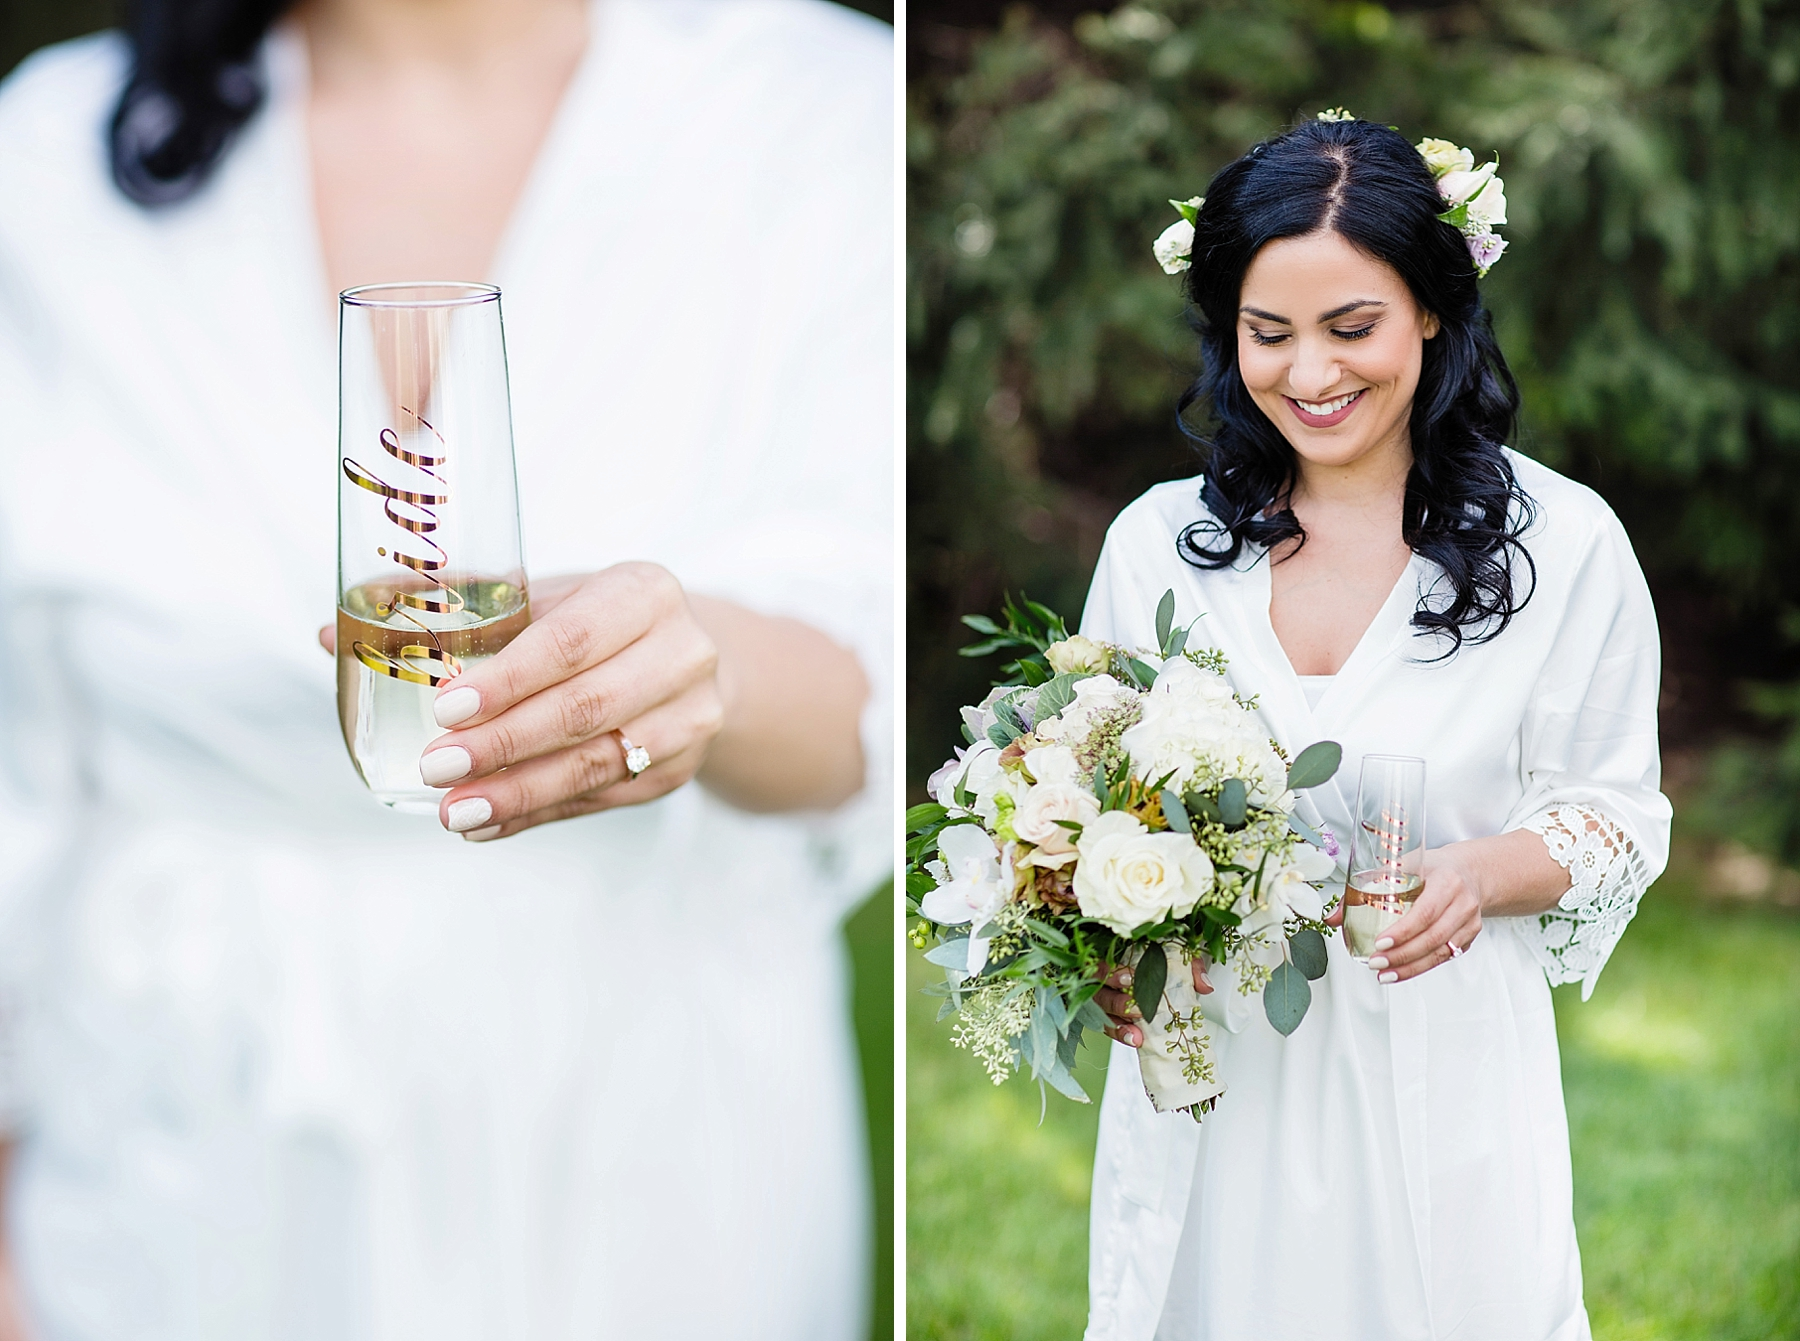 windsor-wedding-photographer-sprucewood-shores-winery-wedding-niagara-on-the-lake-wedding-photographer-eryn-shea-photography_0010.jpg